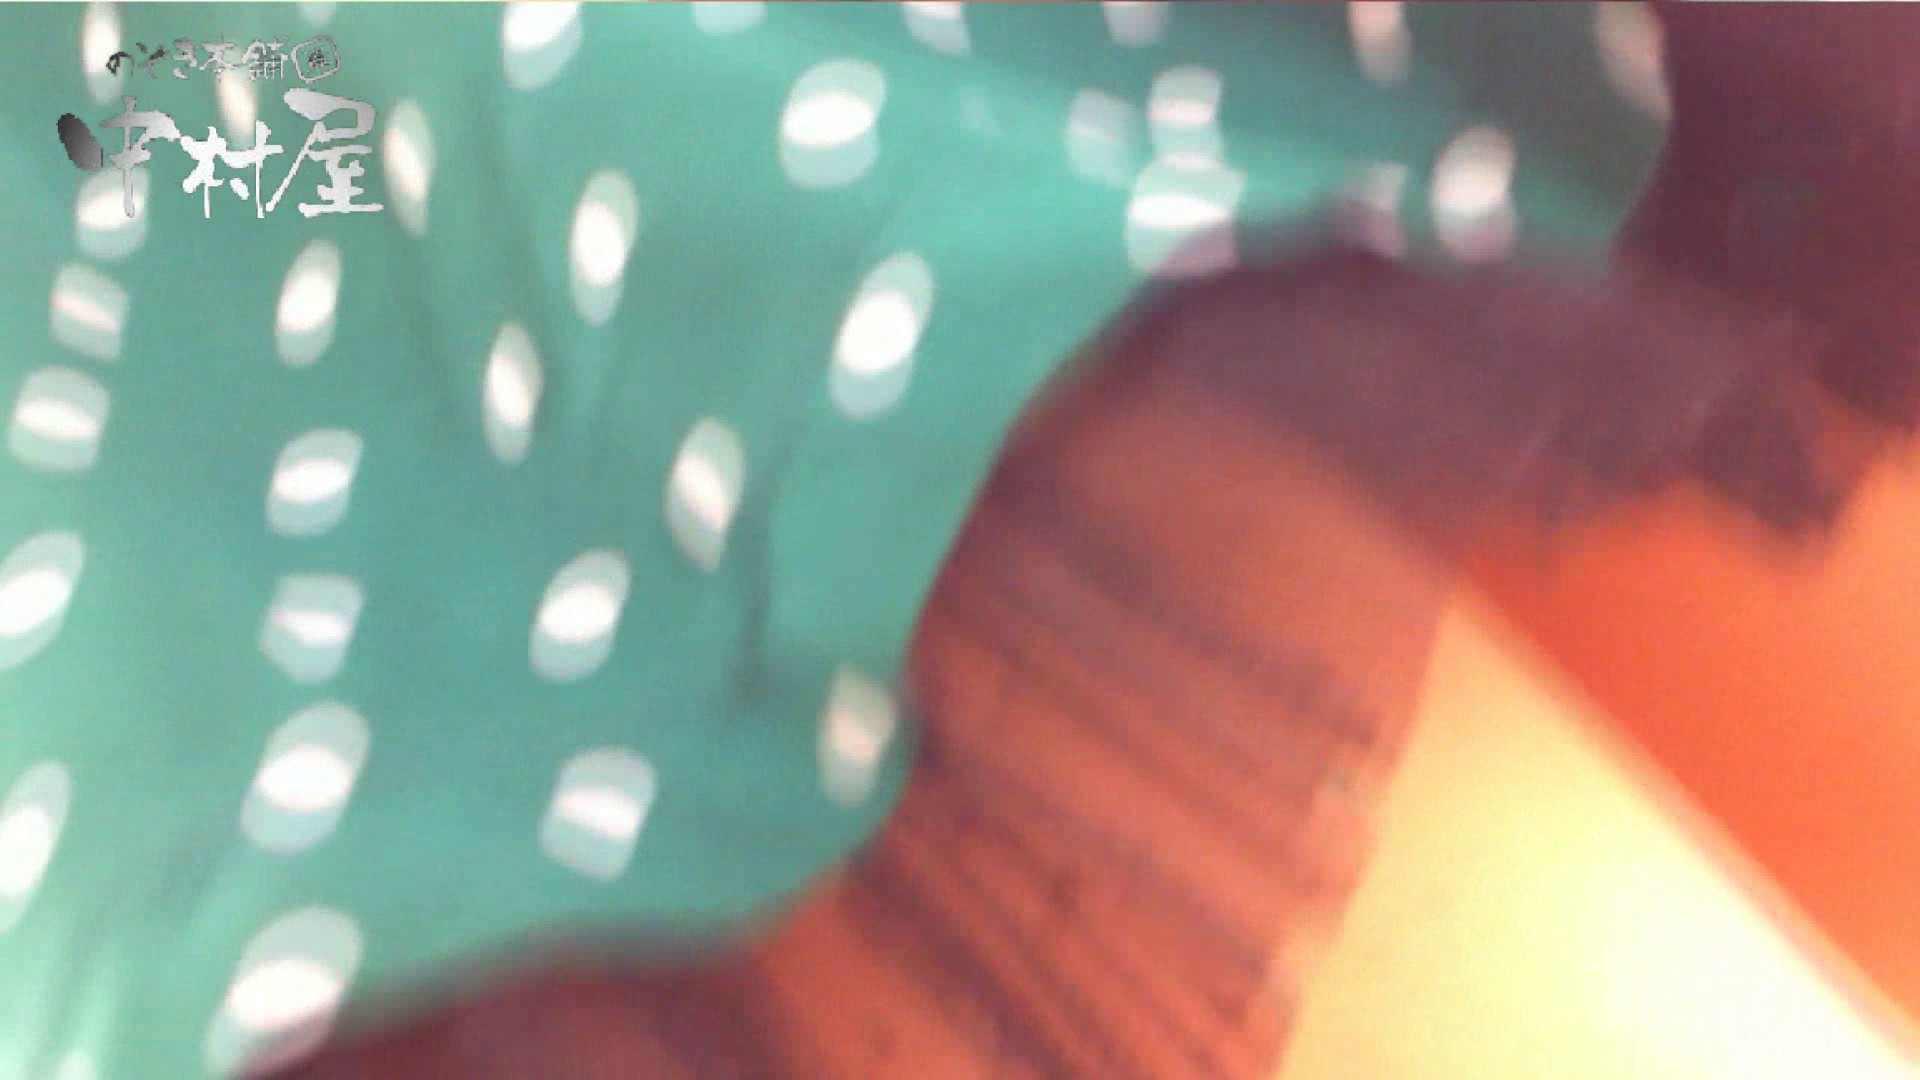 vol.48可愛いカリスマ店員胸チラ&パンチラ アニメ声の店員さん パンチラ | チラ  110画像 81